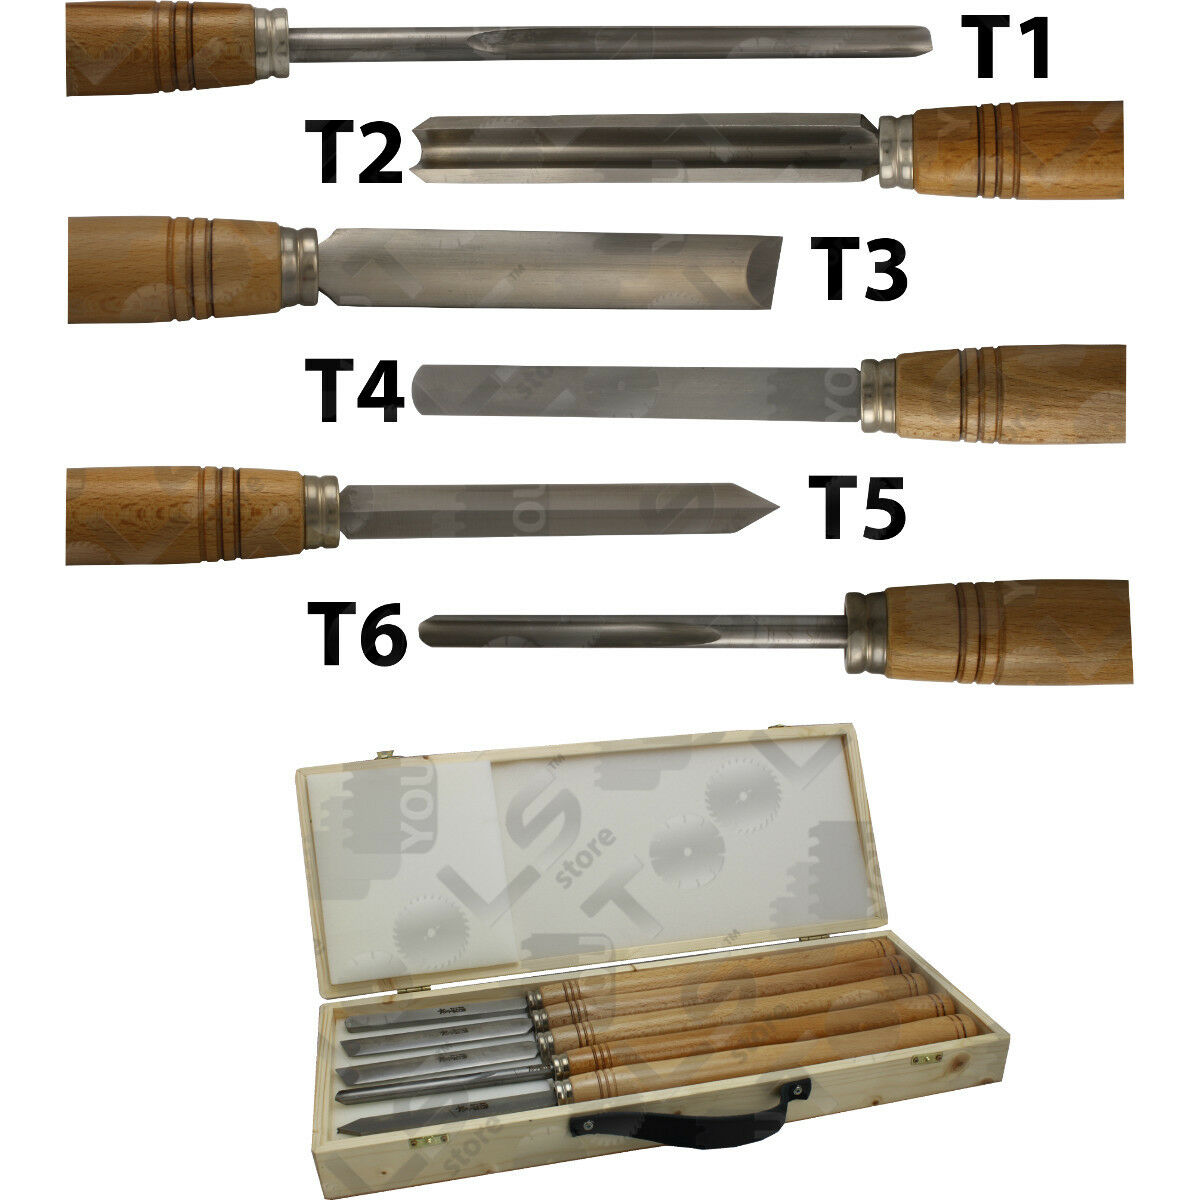 Utensili per tornitore in acciaio HSS alta qualità affilatura duratura